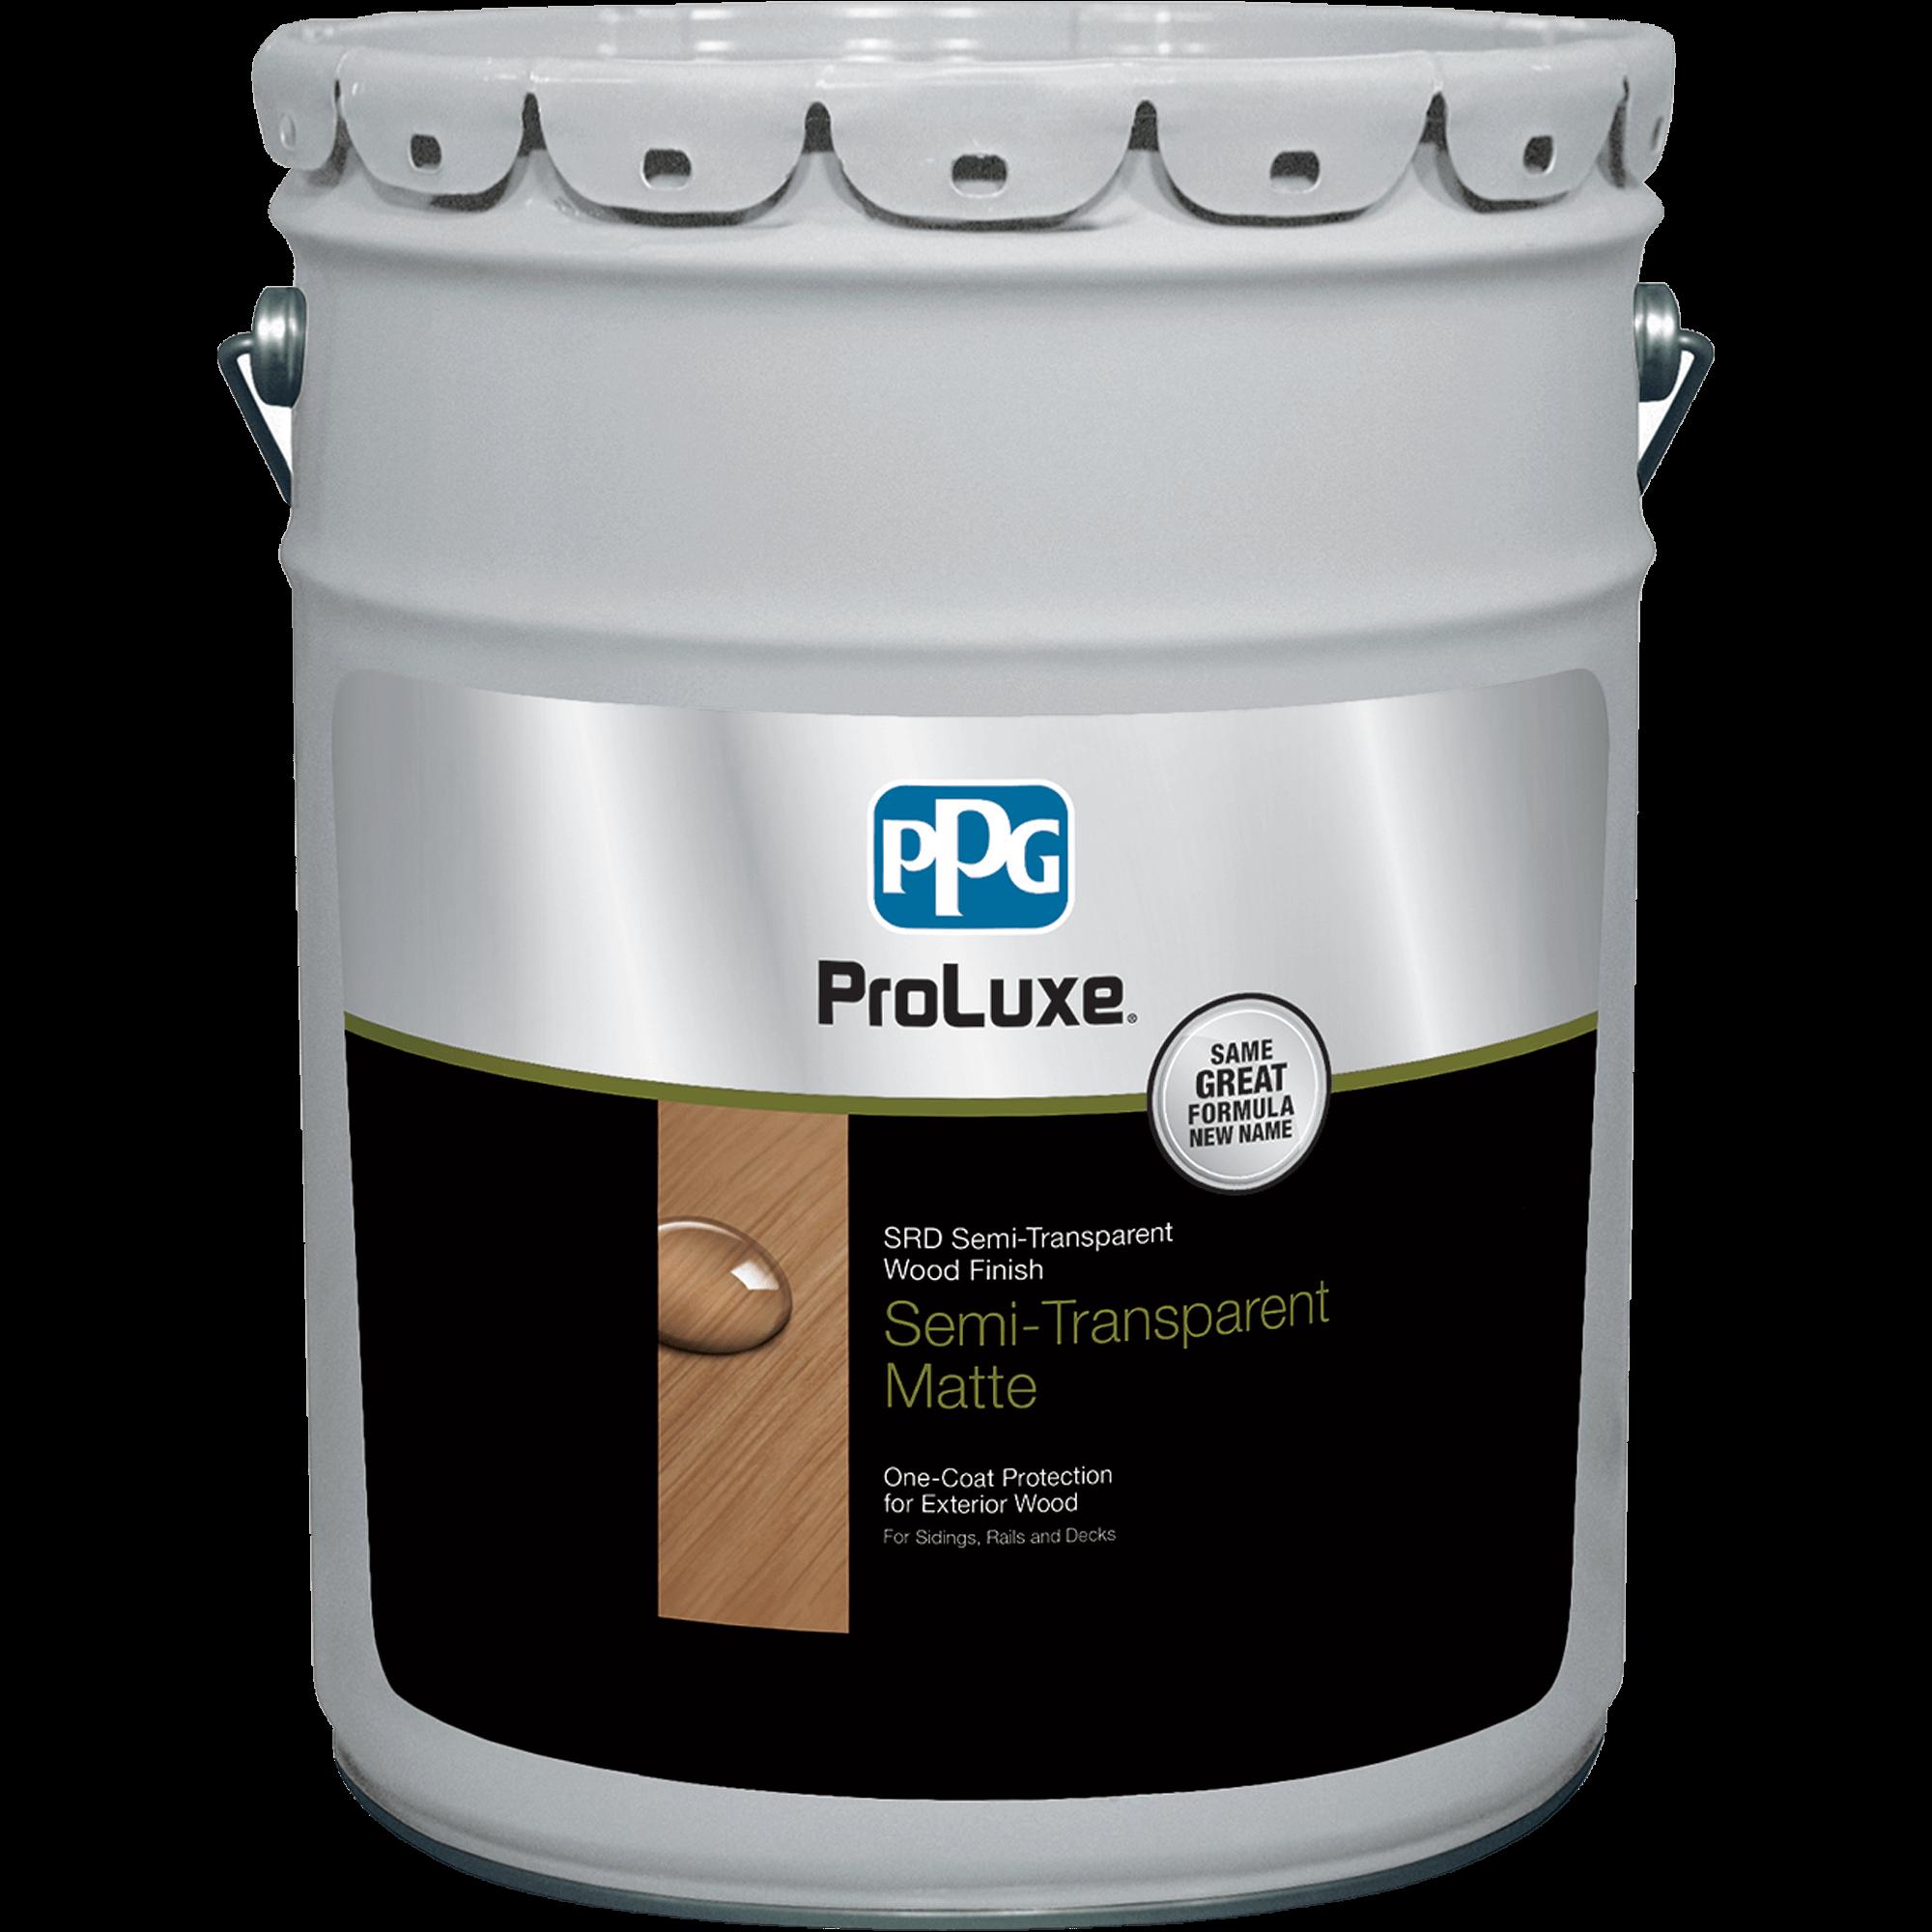 PROLUXE<sup>®</sup> SRD Semi-Transparent Wood Finish 5 gallon